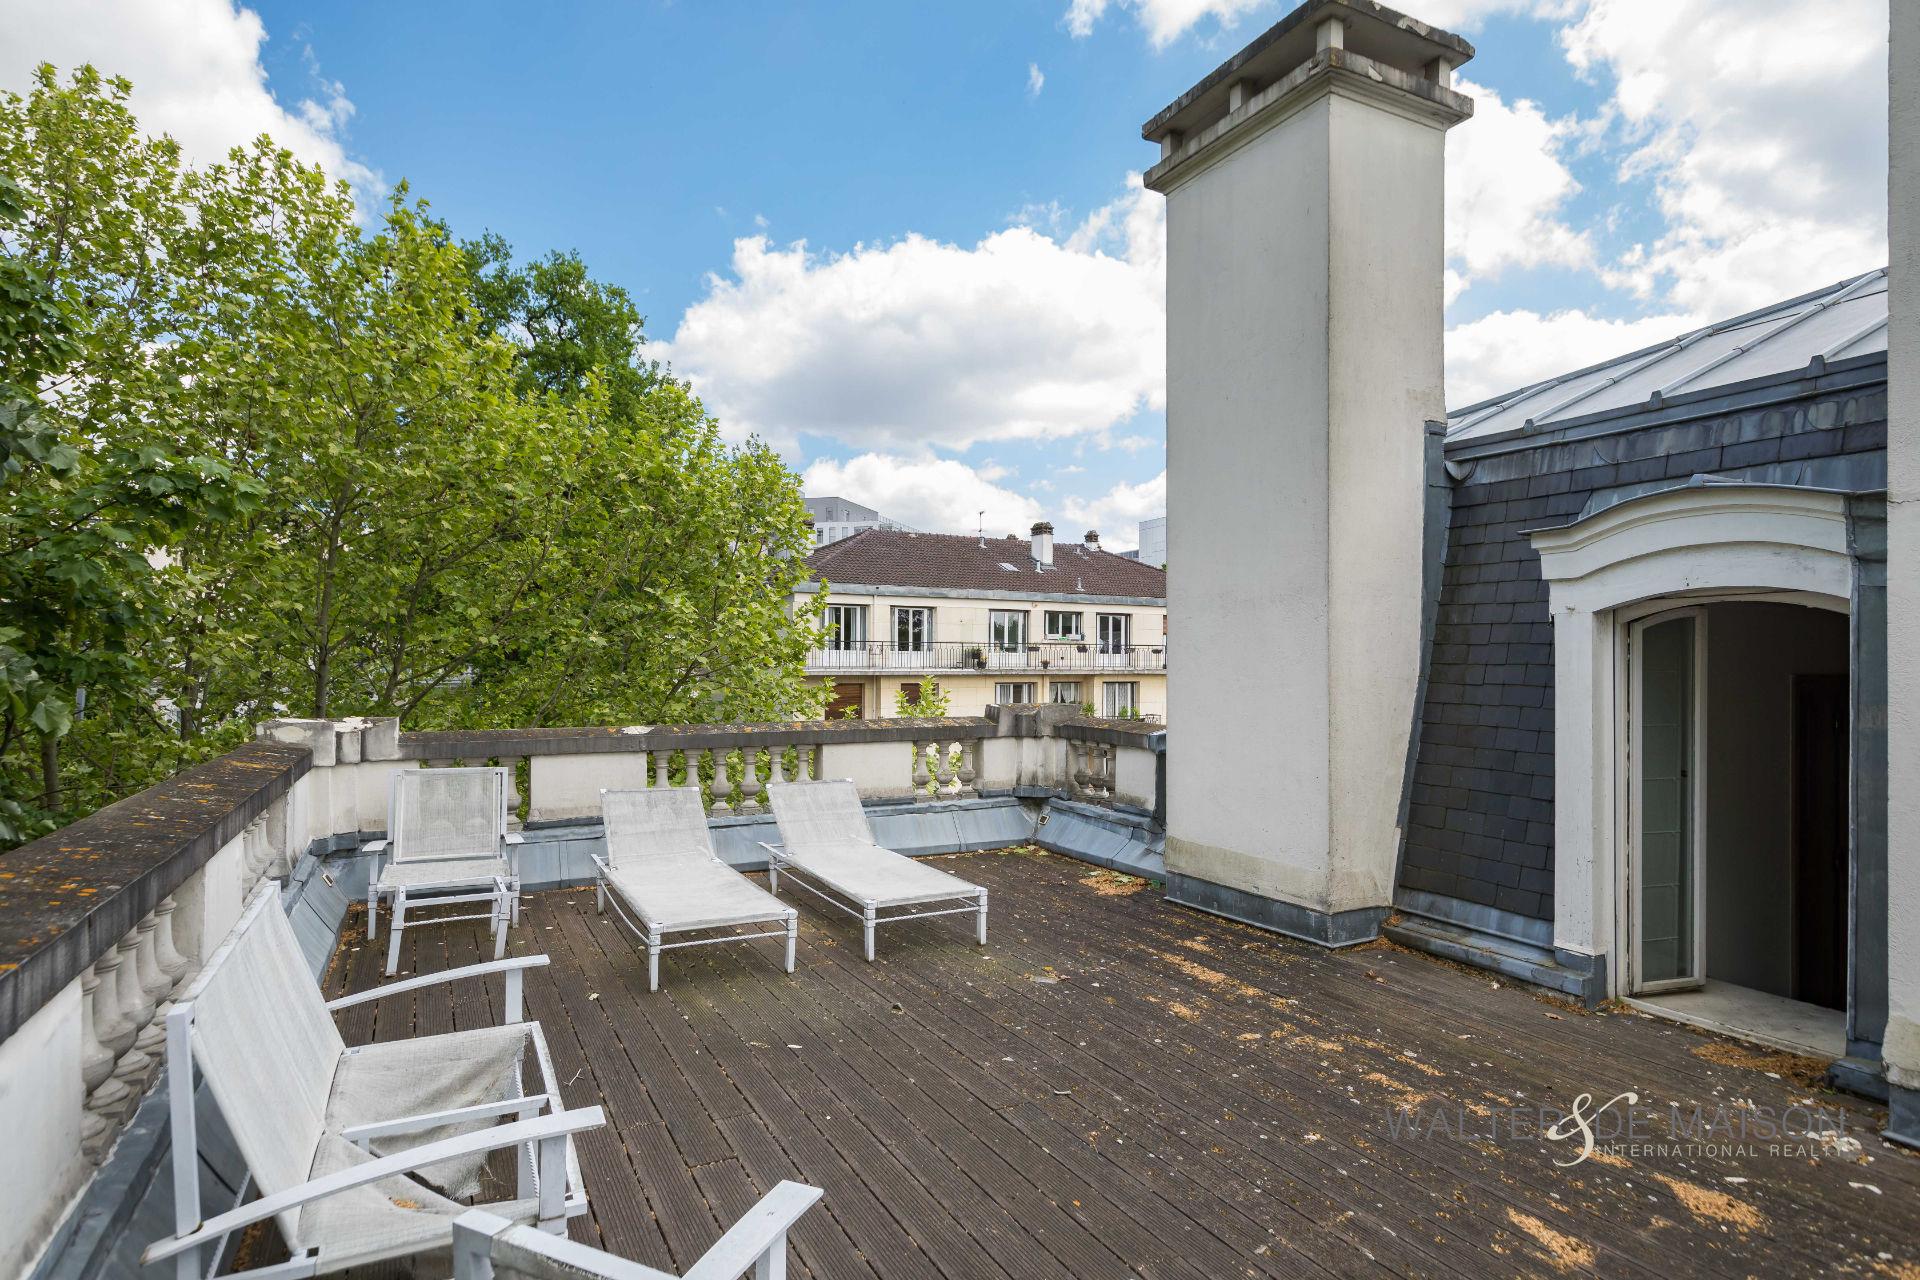 Hôtel particulier 700 m²                         94130 Nogent sur Marne